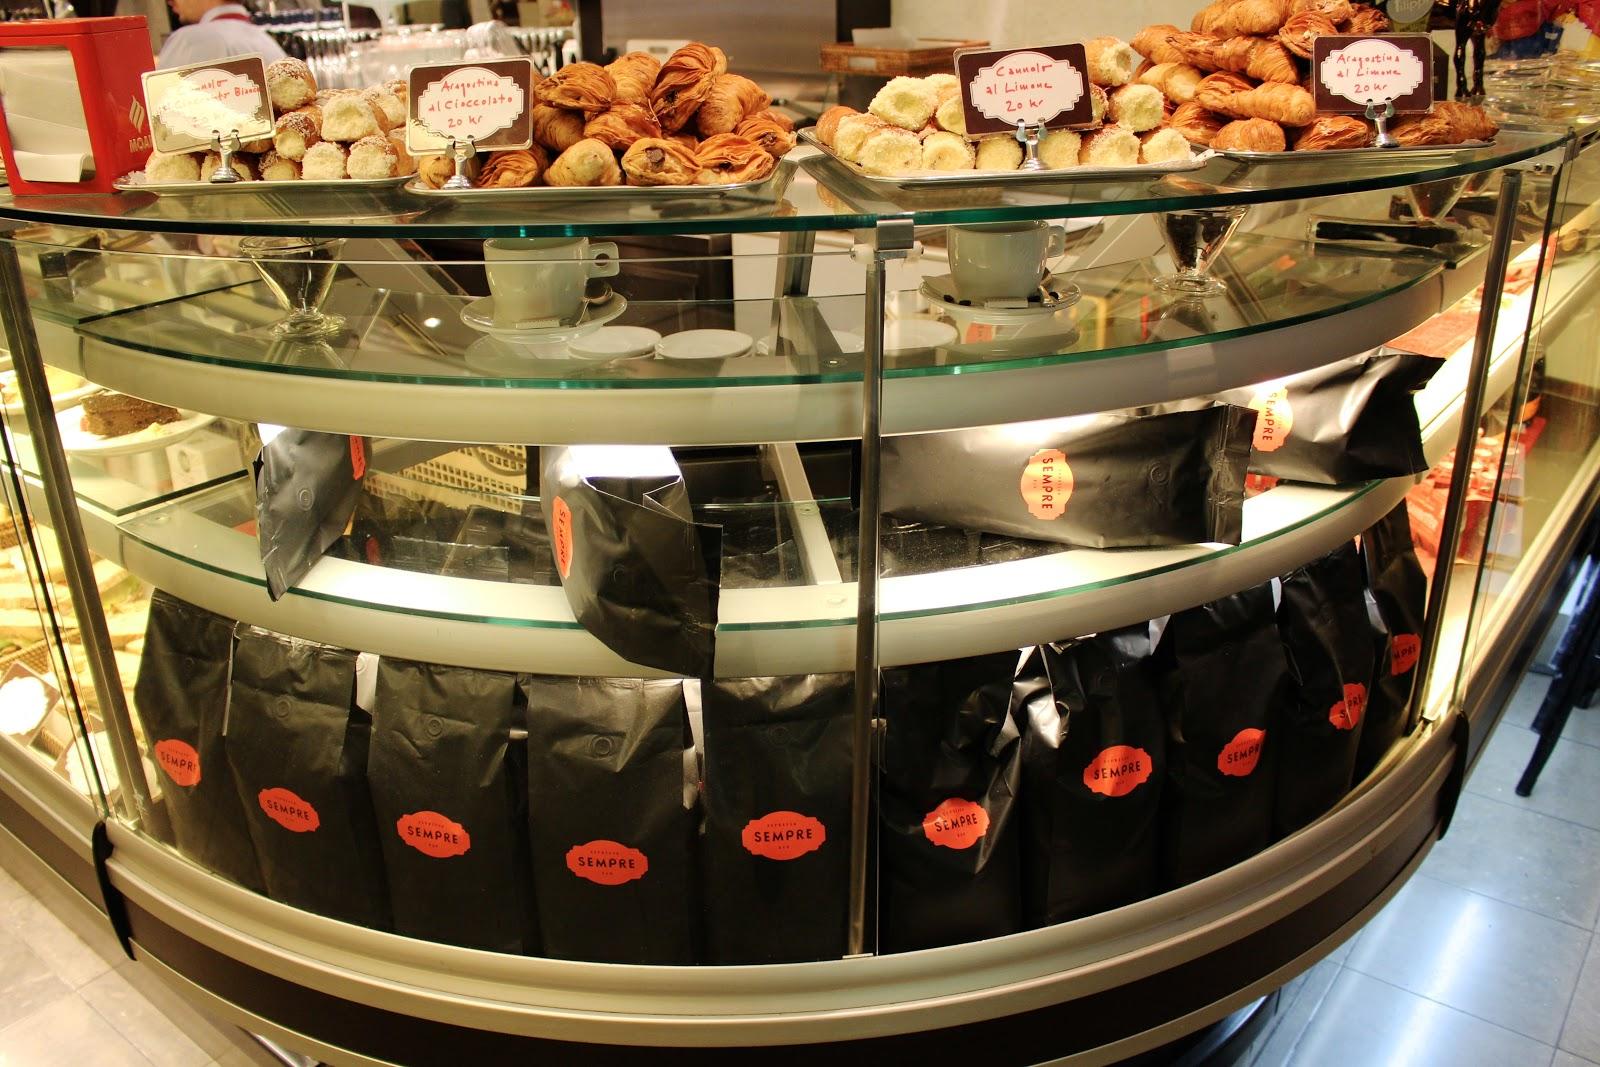 Best coffee & fika in stockholm: Sempre espresso bar